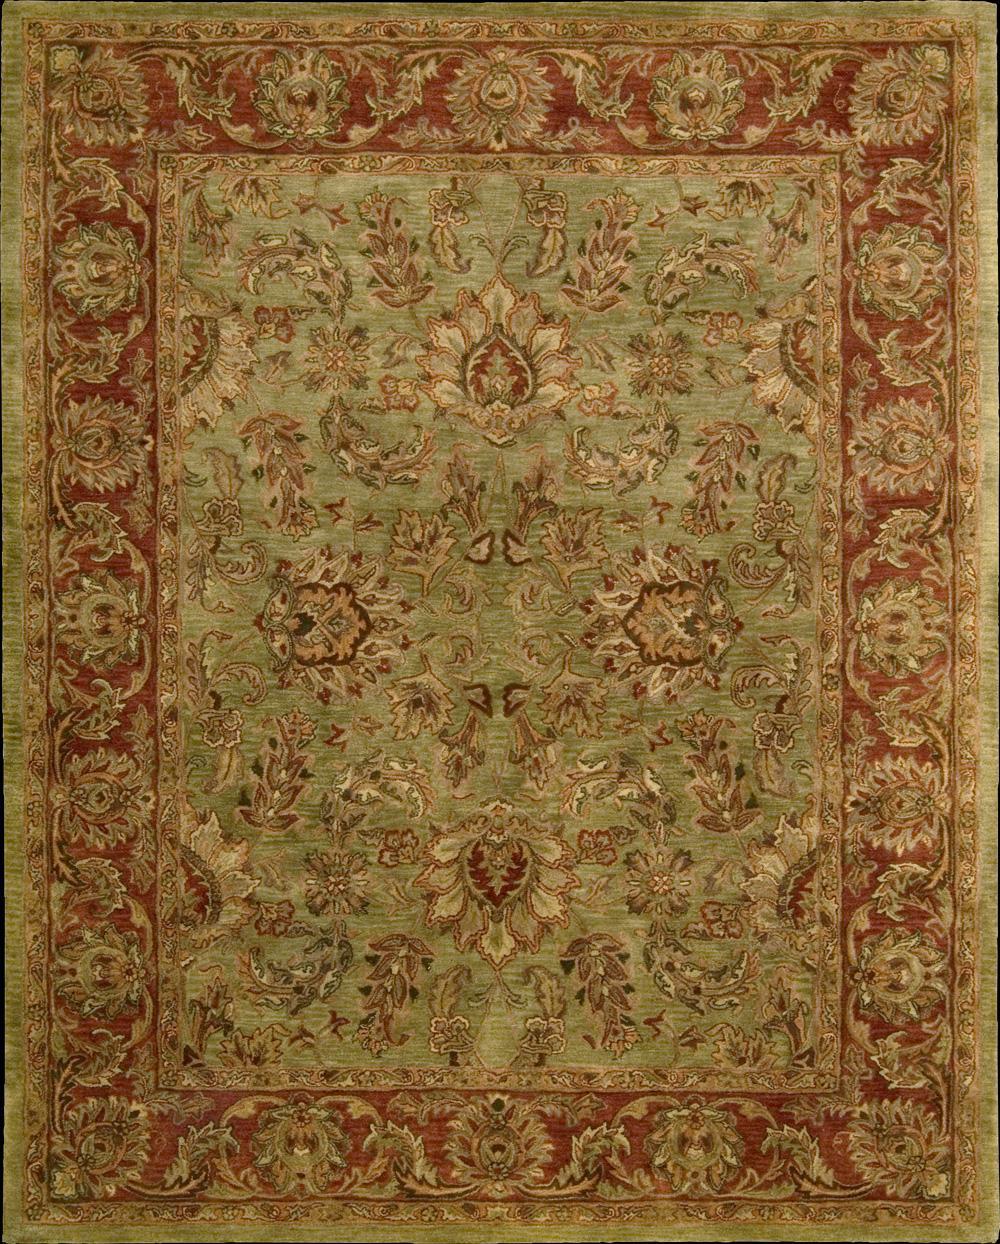 "Nourison Jaipur Area Rug 5'6"" x 8'6"" - Item Number: 30068"